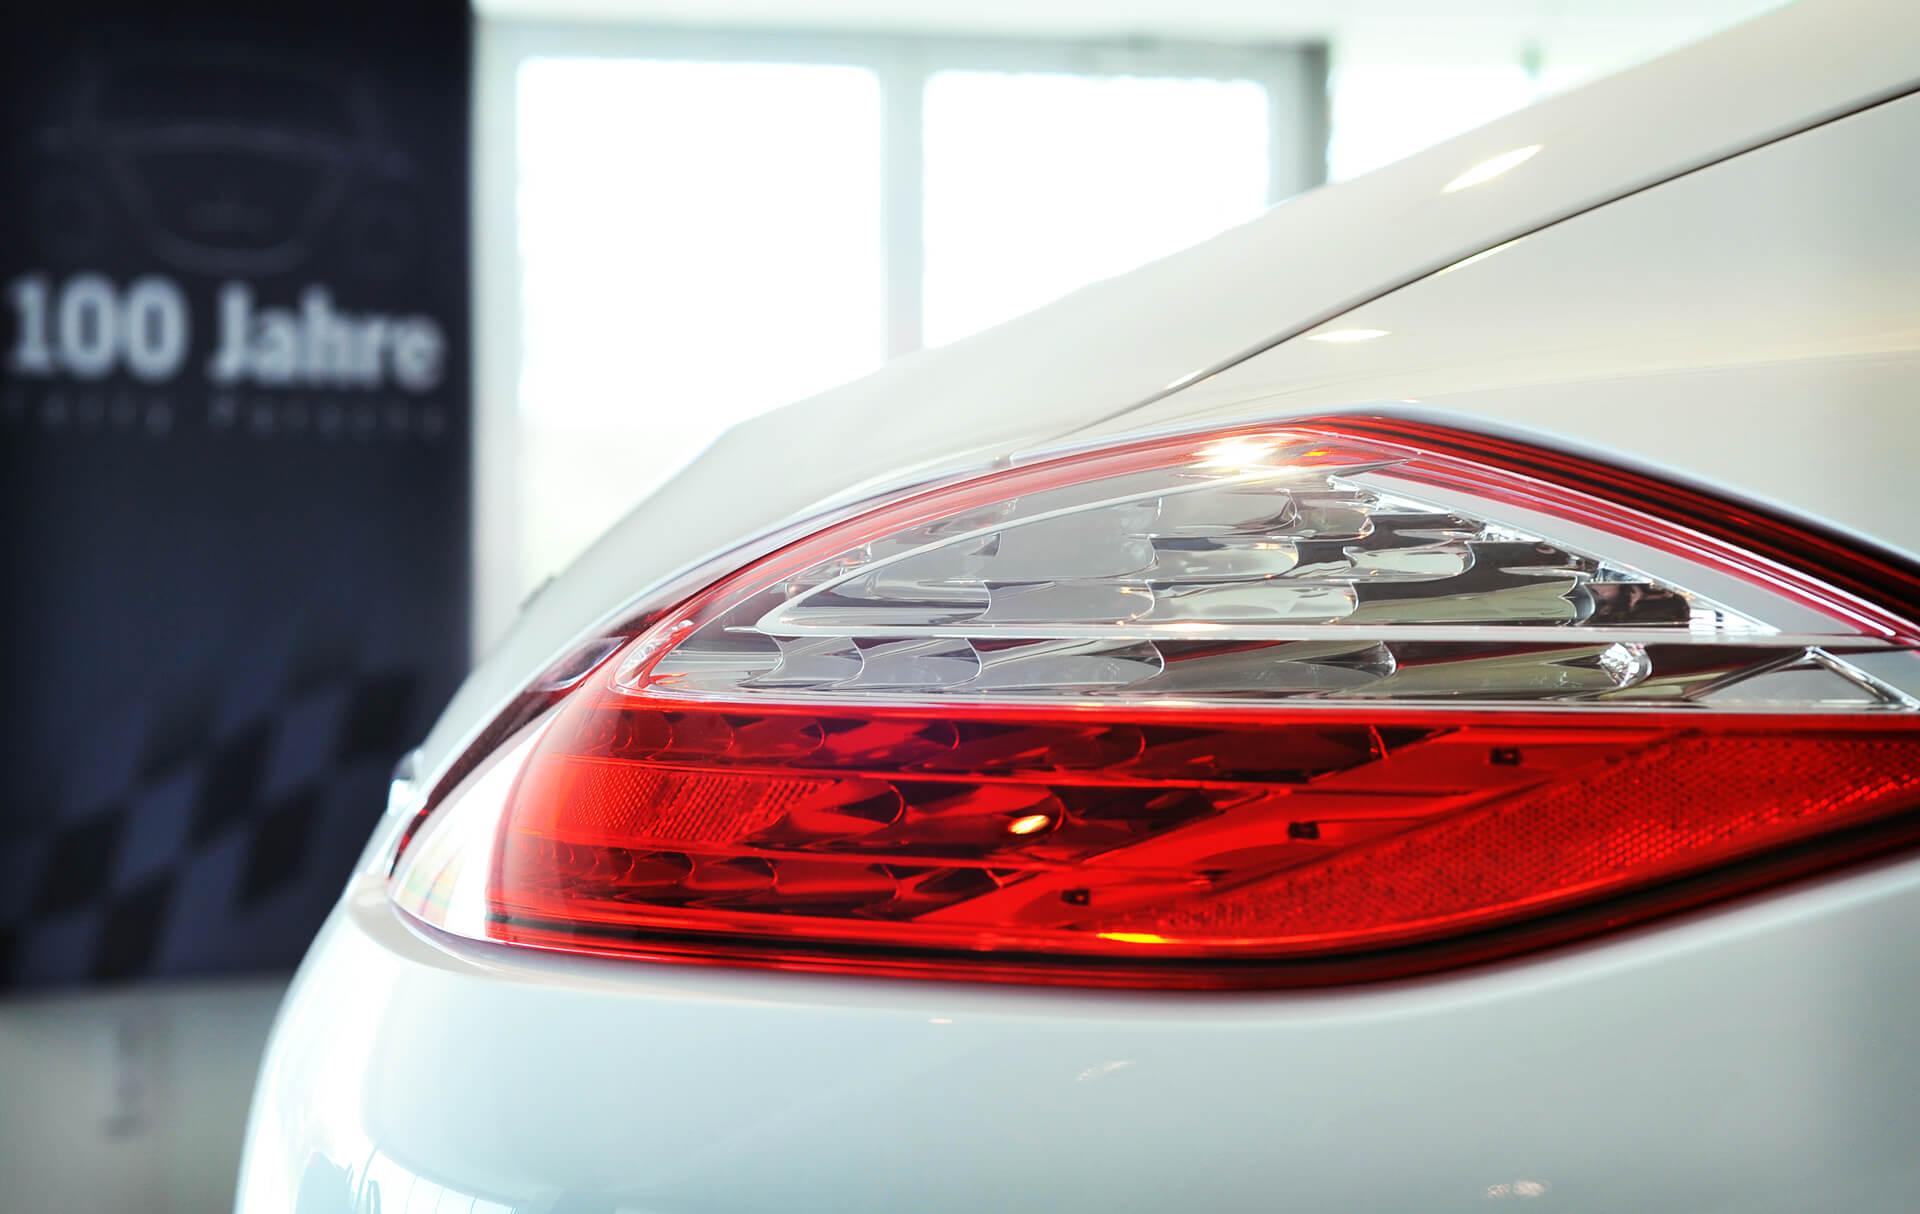 Firmeshooting München Porsche Design Porsche 5 Seen Porsche Werbeprospekt